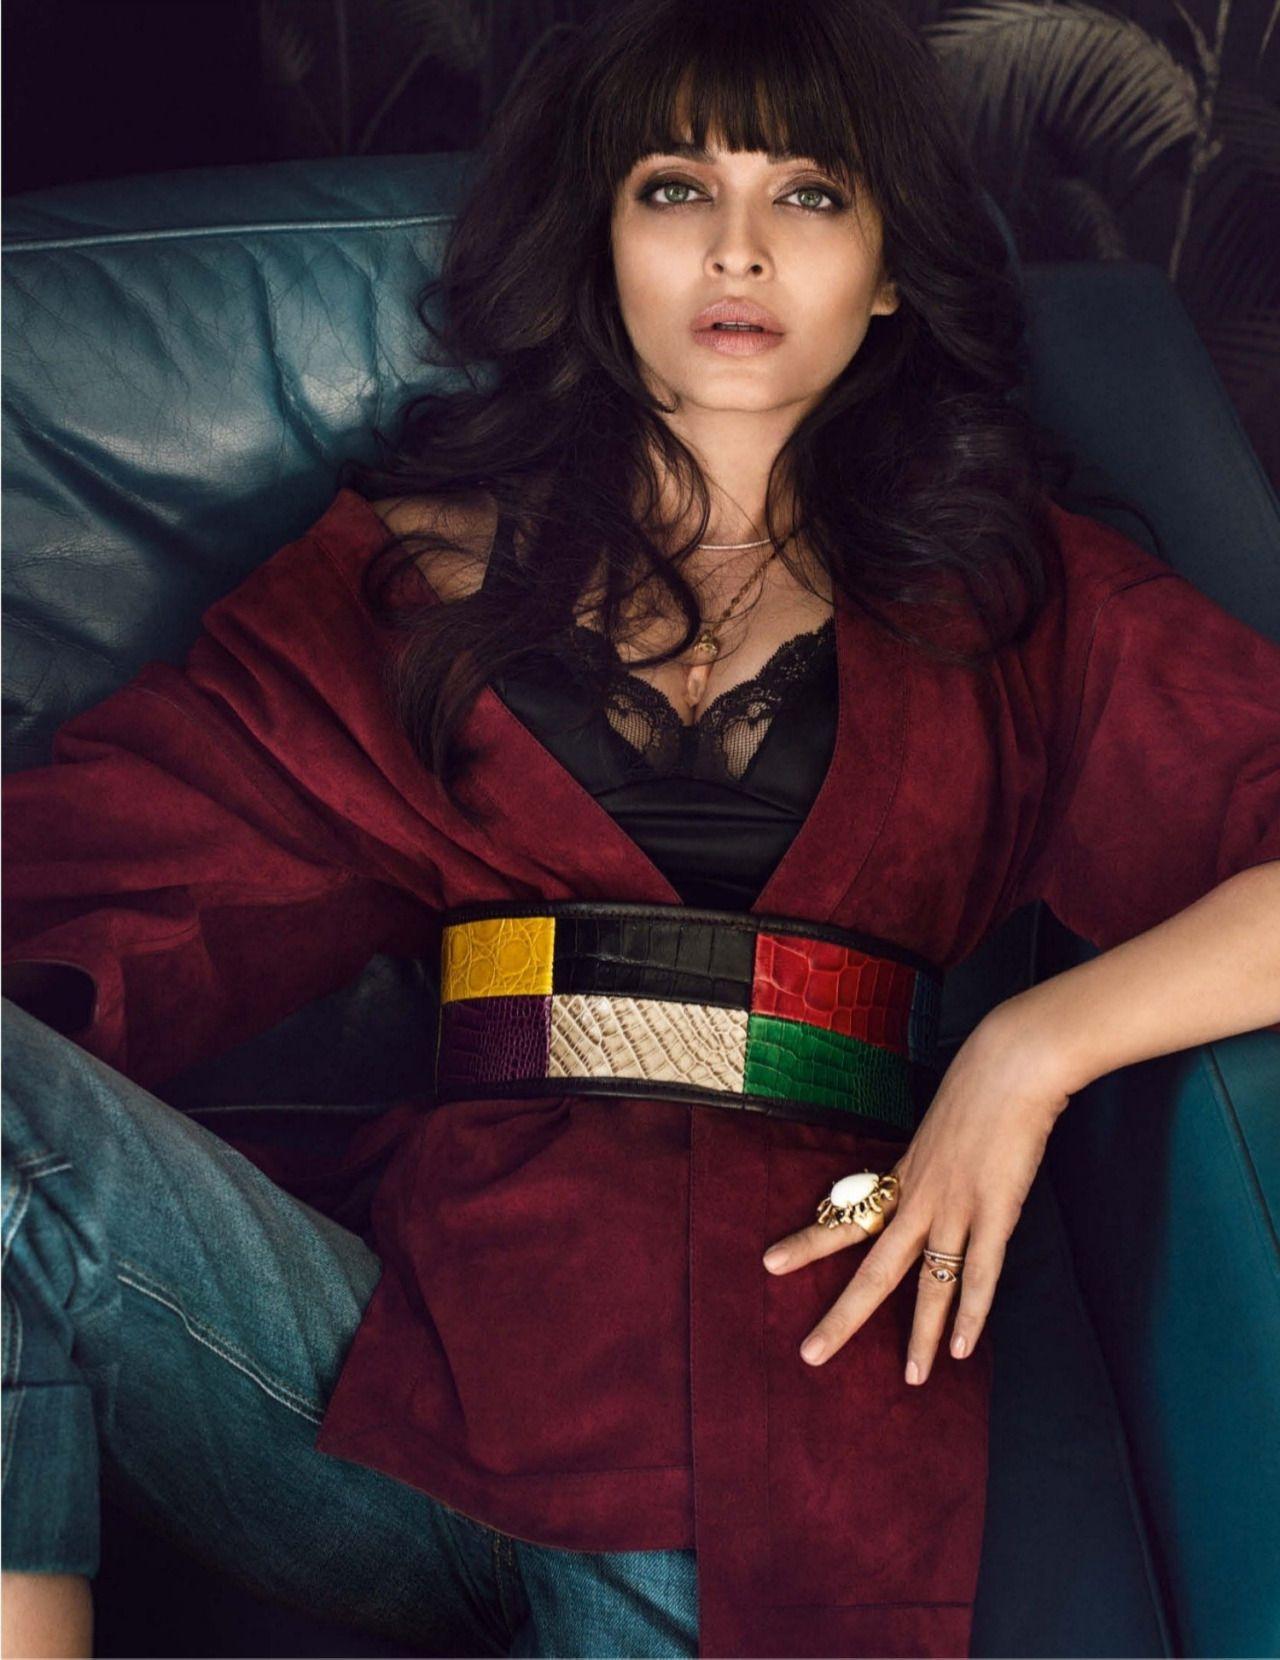 Aishwarya Rai S Vogue Photo Shoot Is Mind Blowingly Awesome Vogue India Fashion Vogue Photo